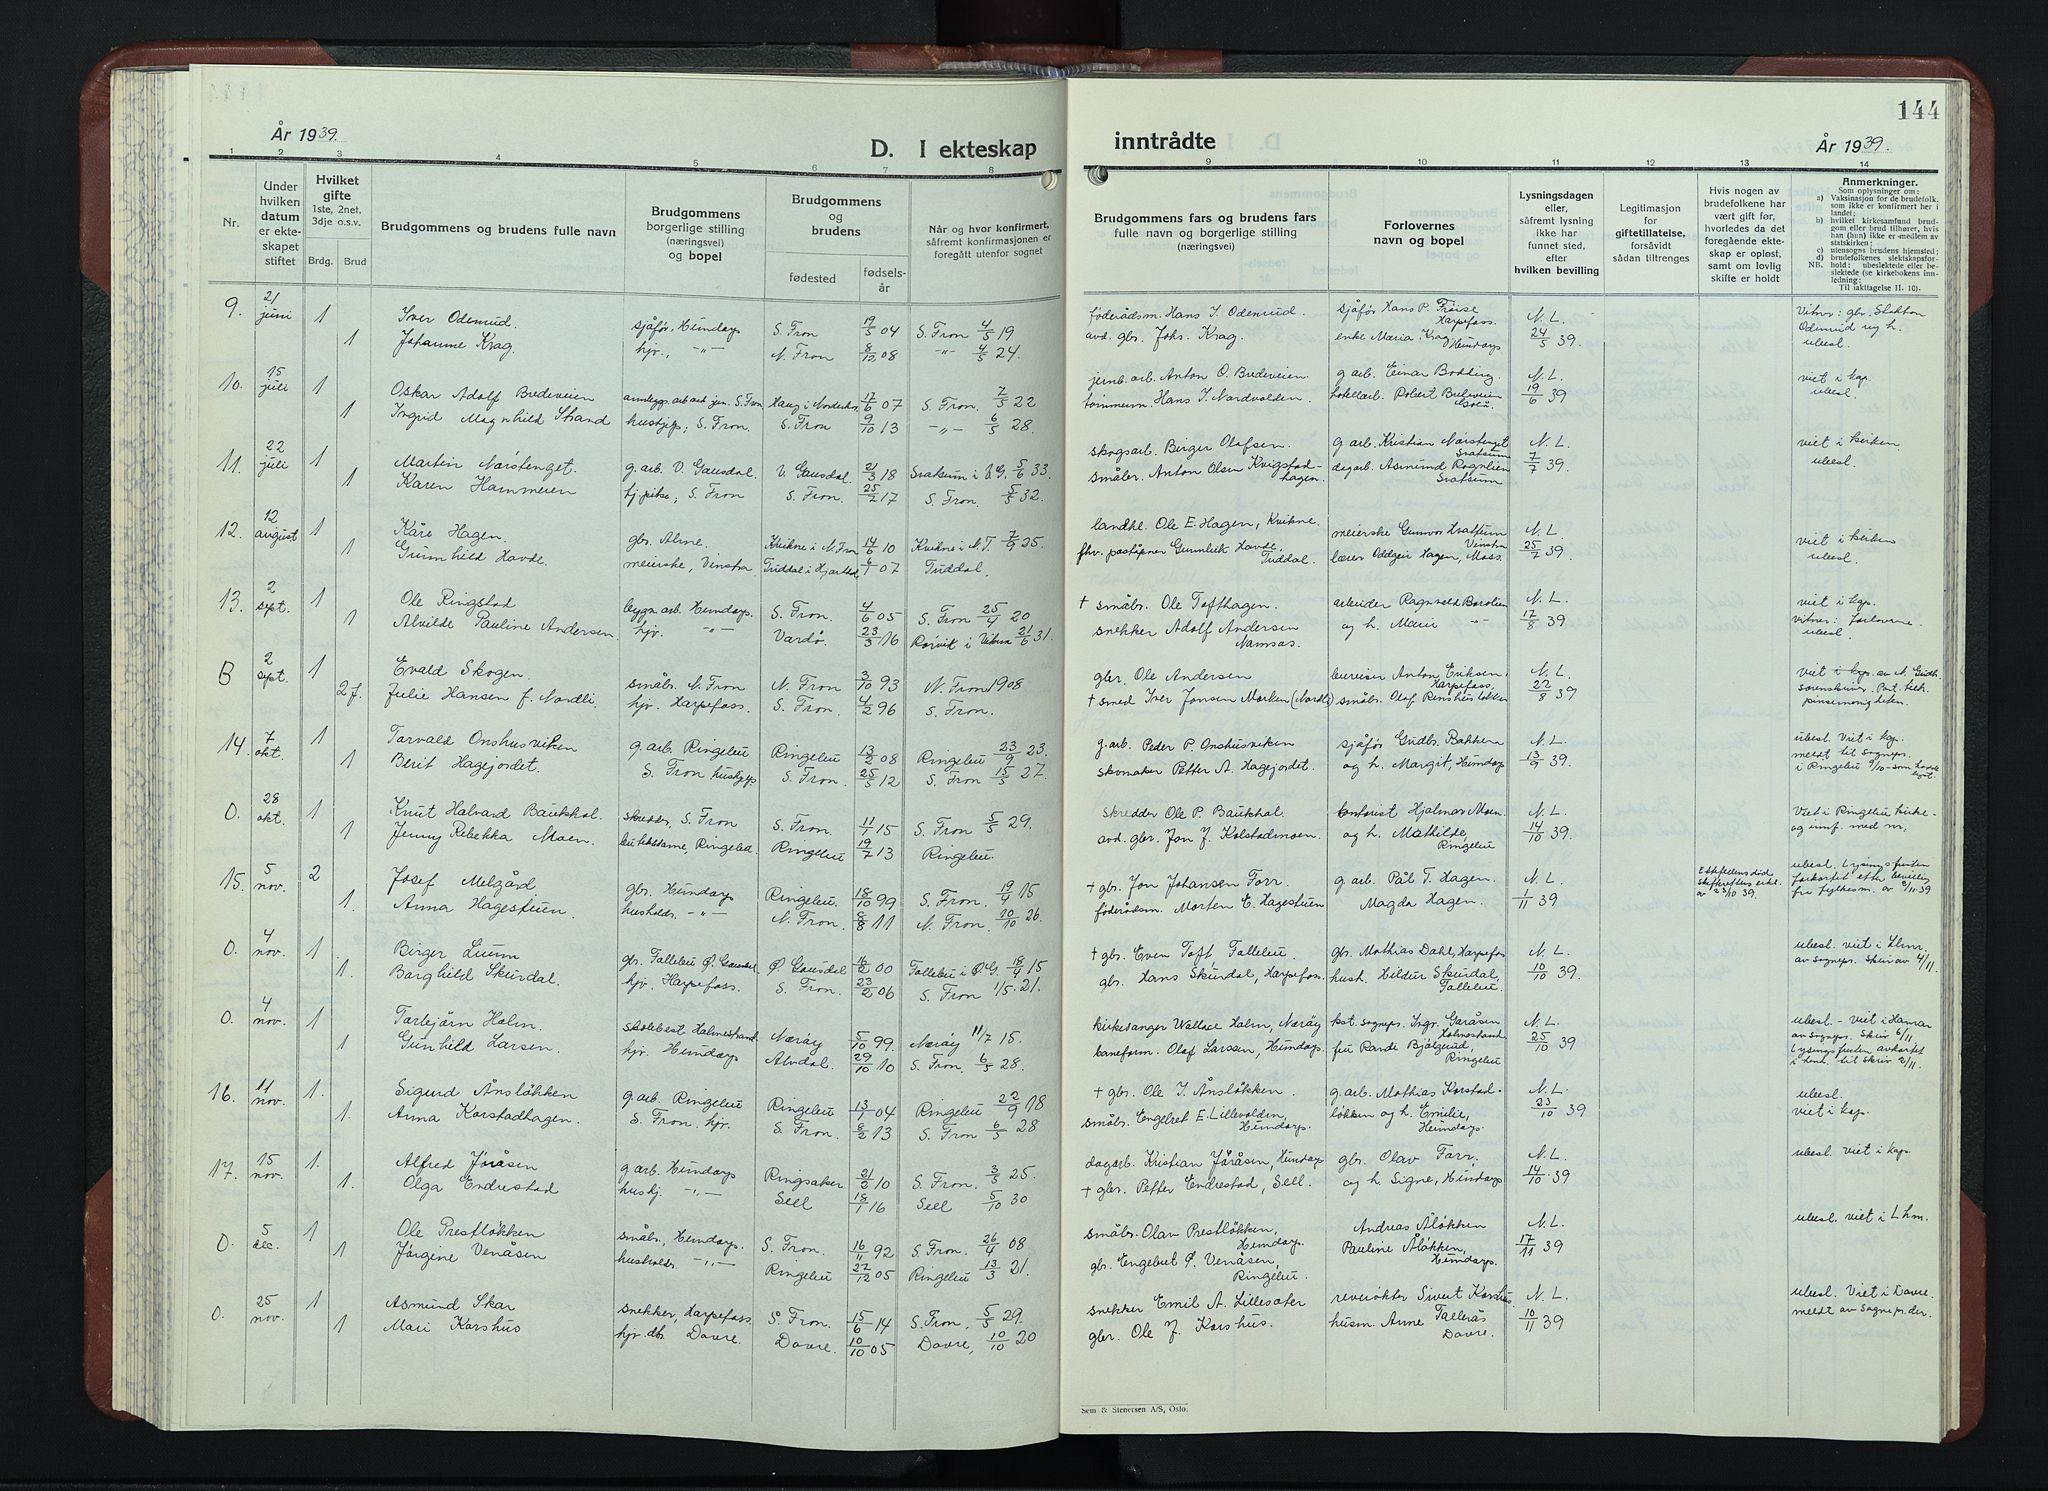 SAH, Sør-Fron prestekontor, H/Ha/Hab/L0006: Klokkerbok nr. 6, 1933-1948, s. 144